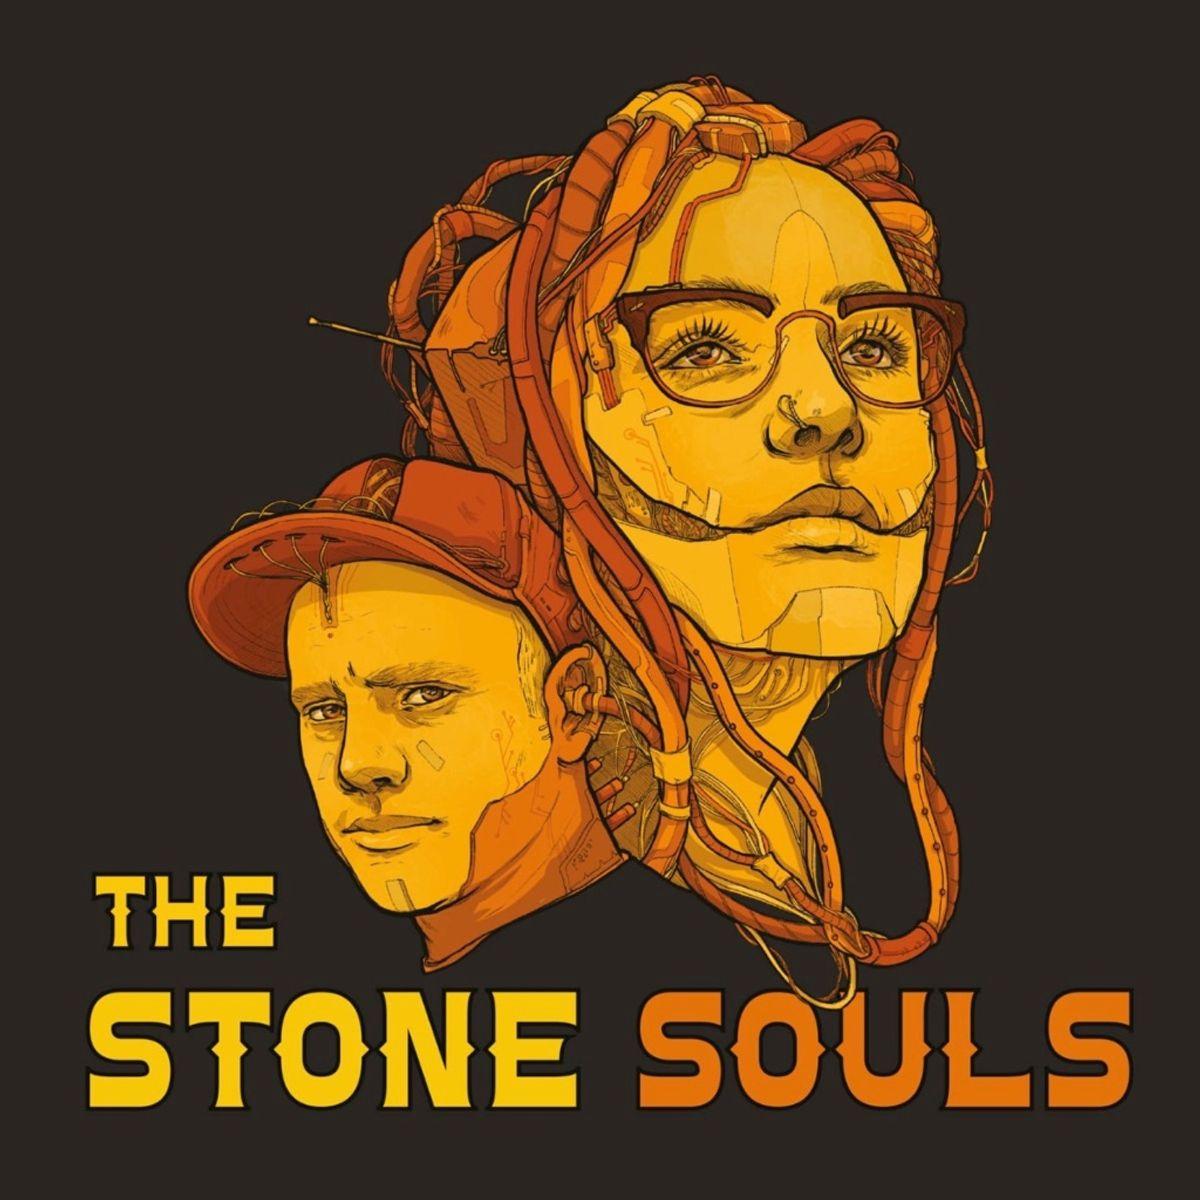 The Stone Souls